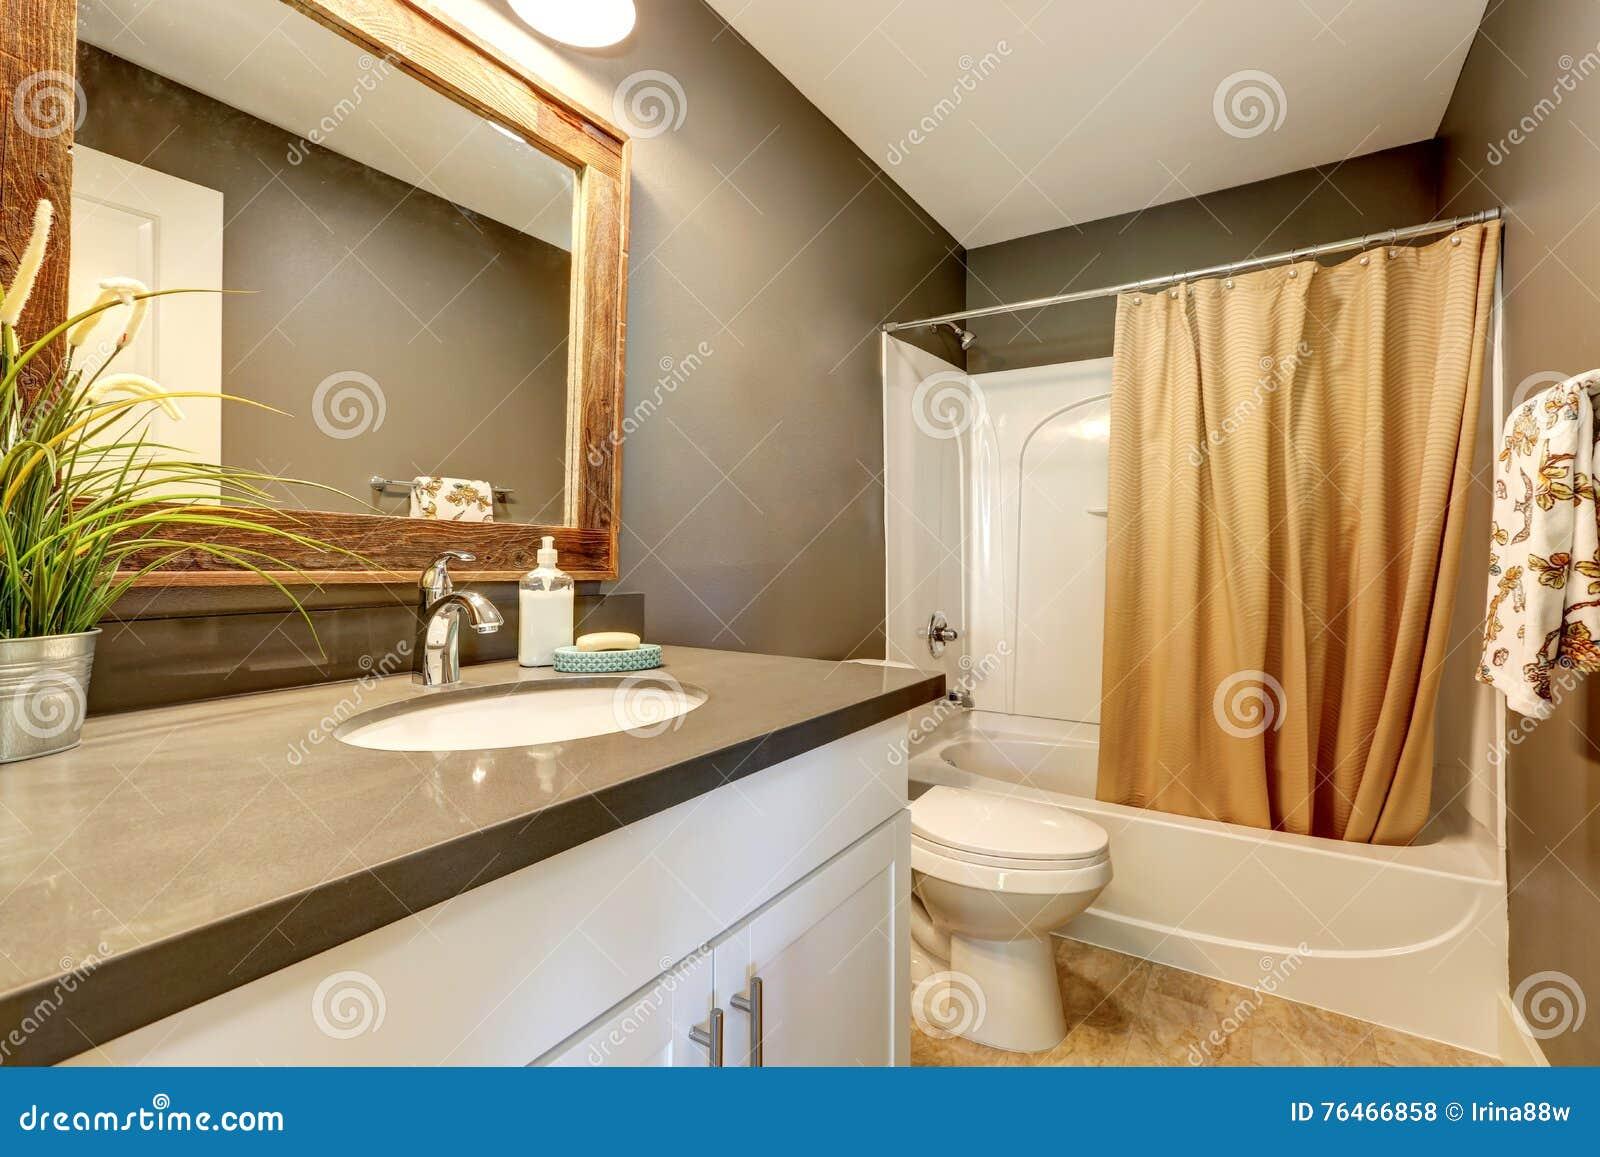 Interior Of Bathroom Grey Walls With White Bathroom Appliances Stock Photo Image Of Room Bathtub 76466858